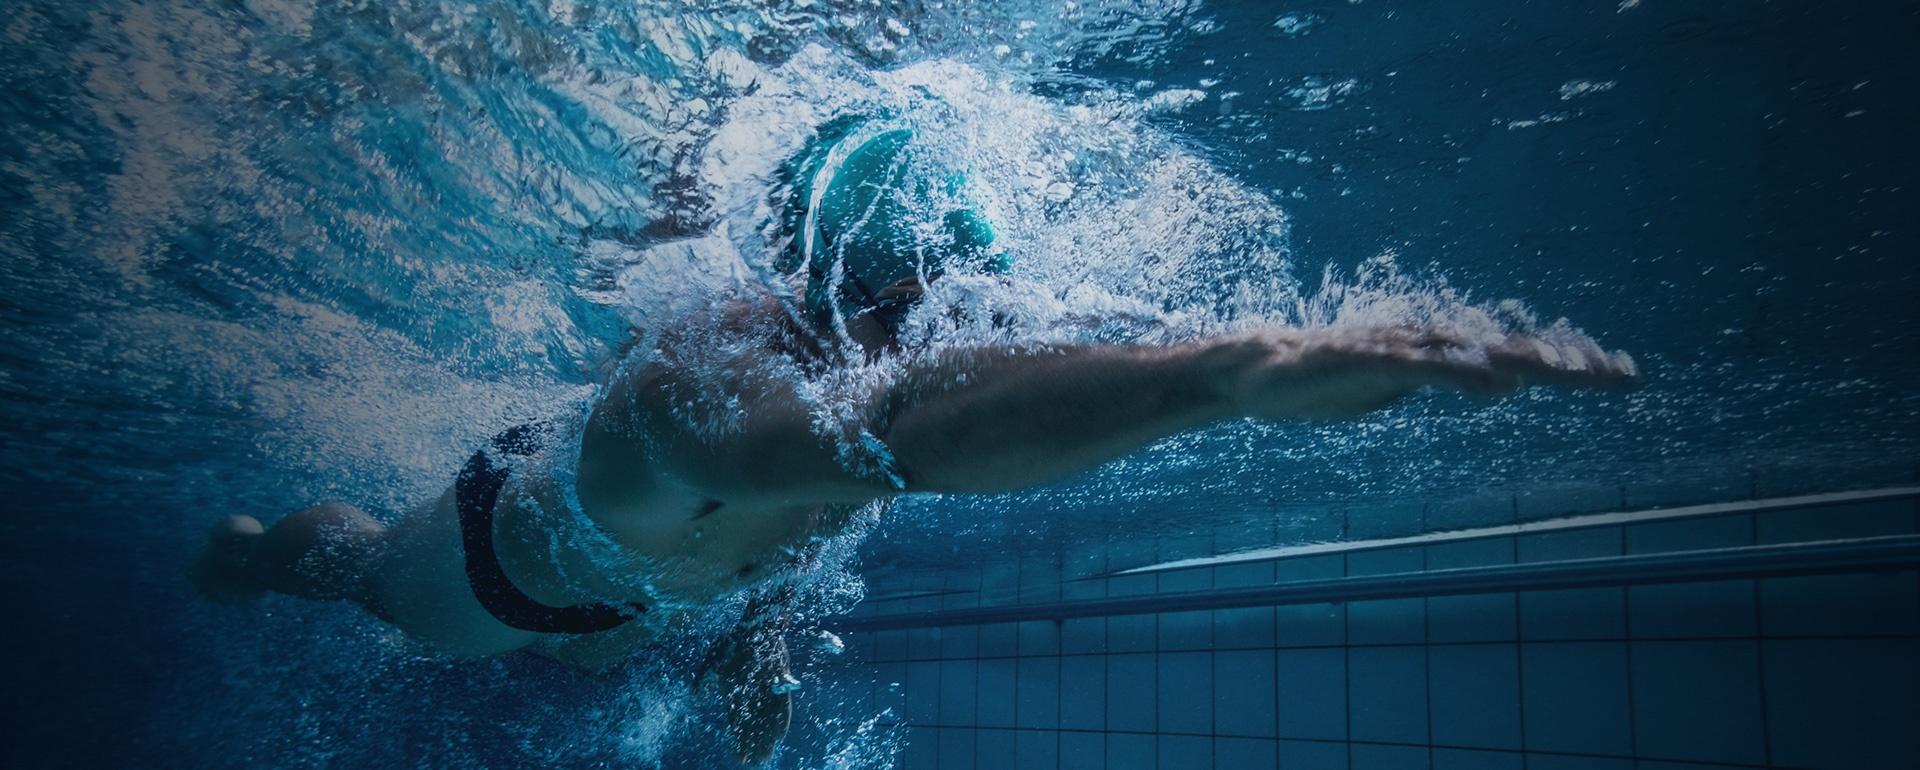 background-swimming.jpg